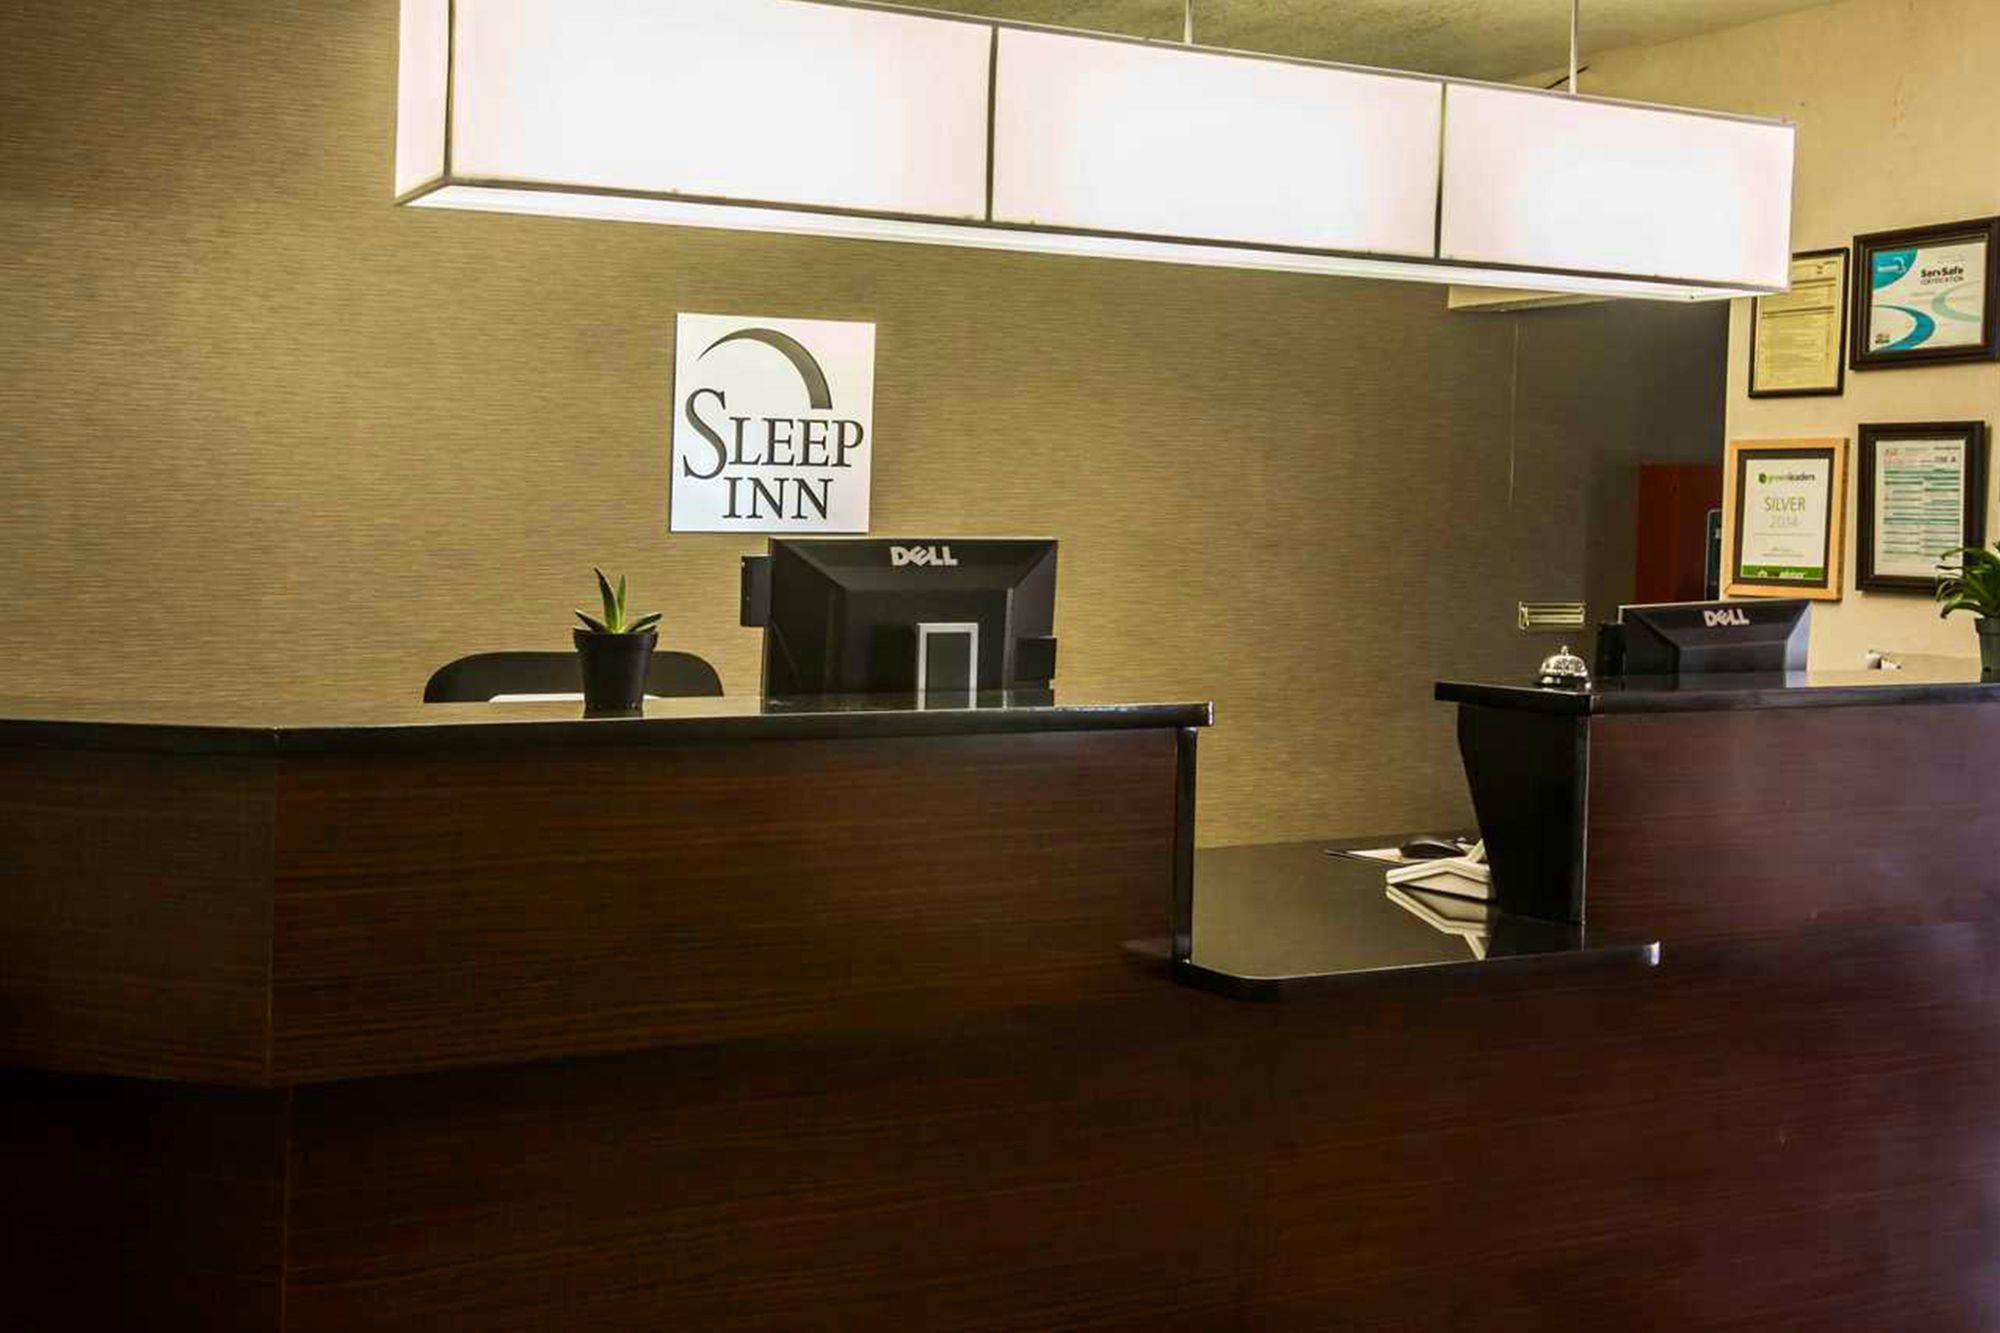 Sleep Inn in Macon, GA